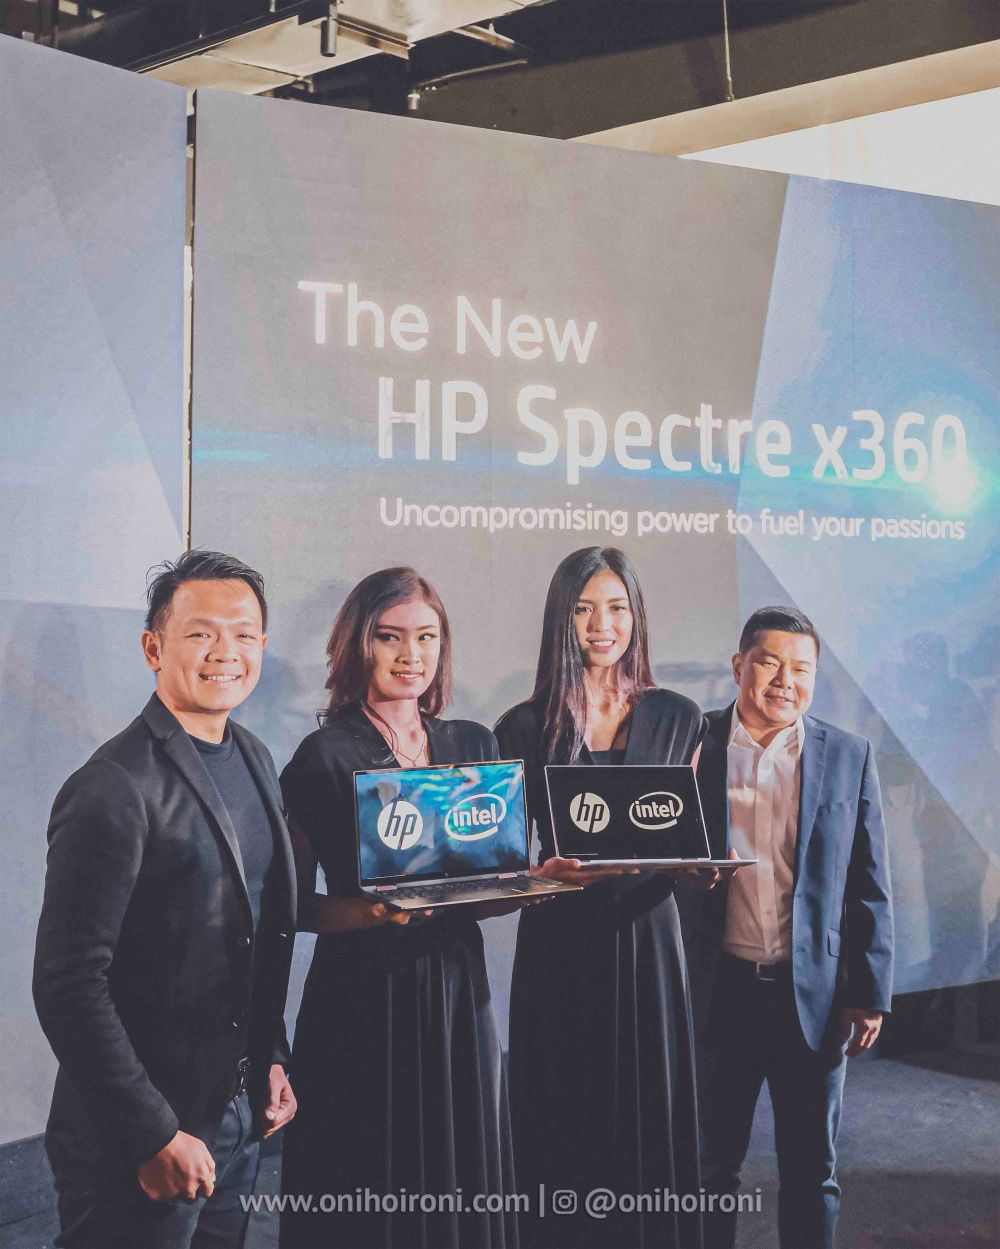 1 Laptop terbaru hp indonesia spectre x360 oni hoironi review laptop terbaru hp indonesia.jpg